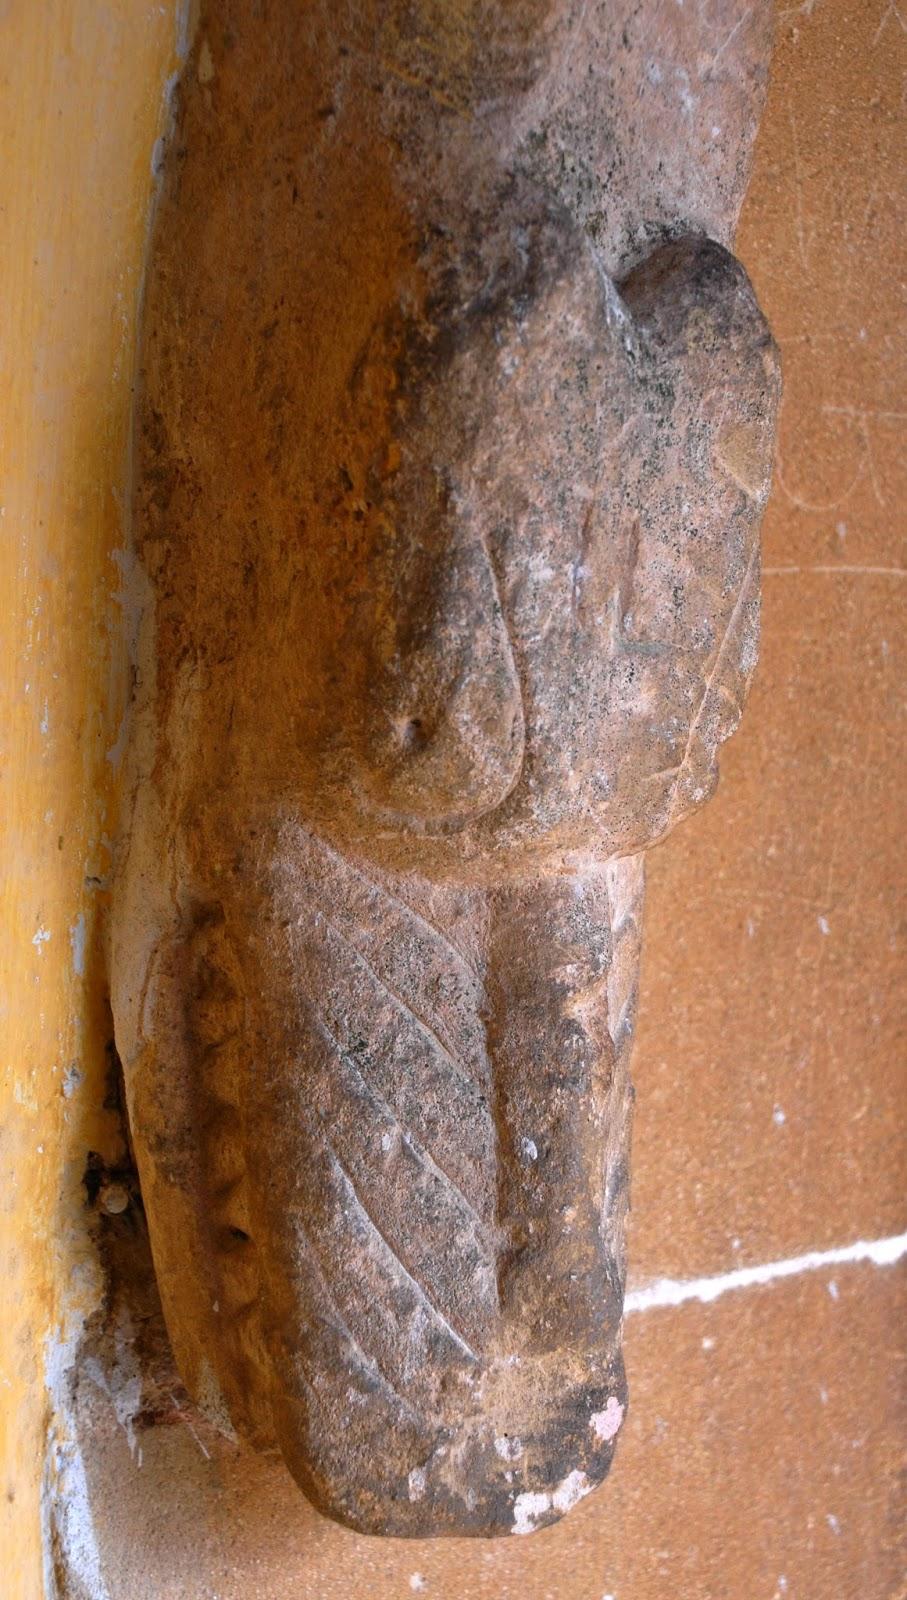 Norman / Romanesque dragon doorstop at Hankerton church, Wiltshire